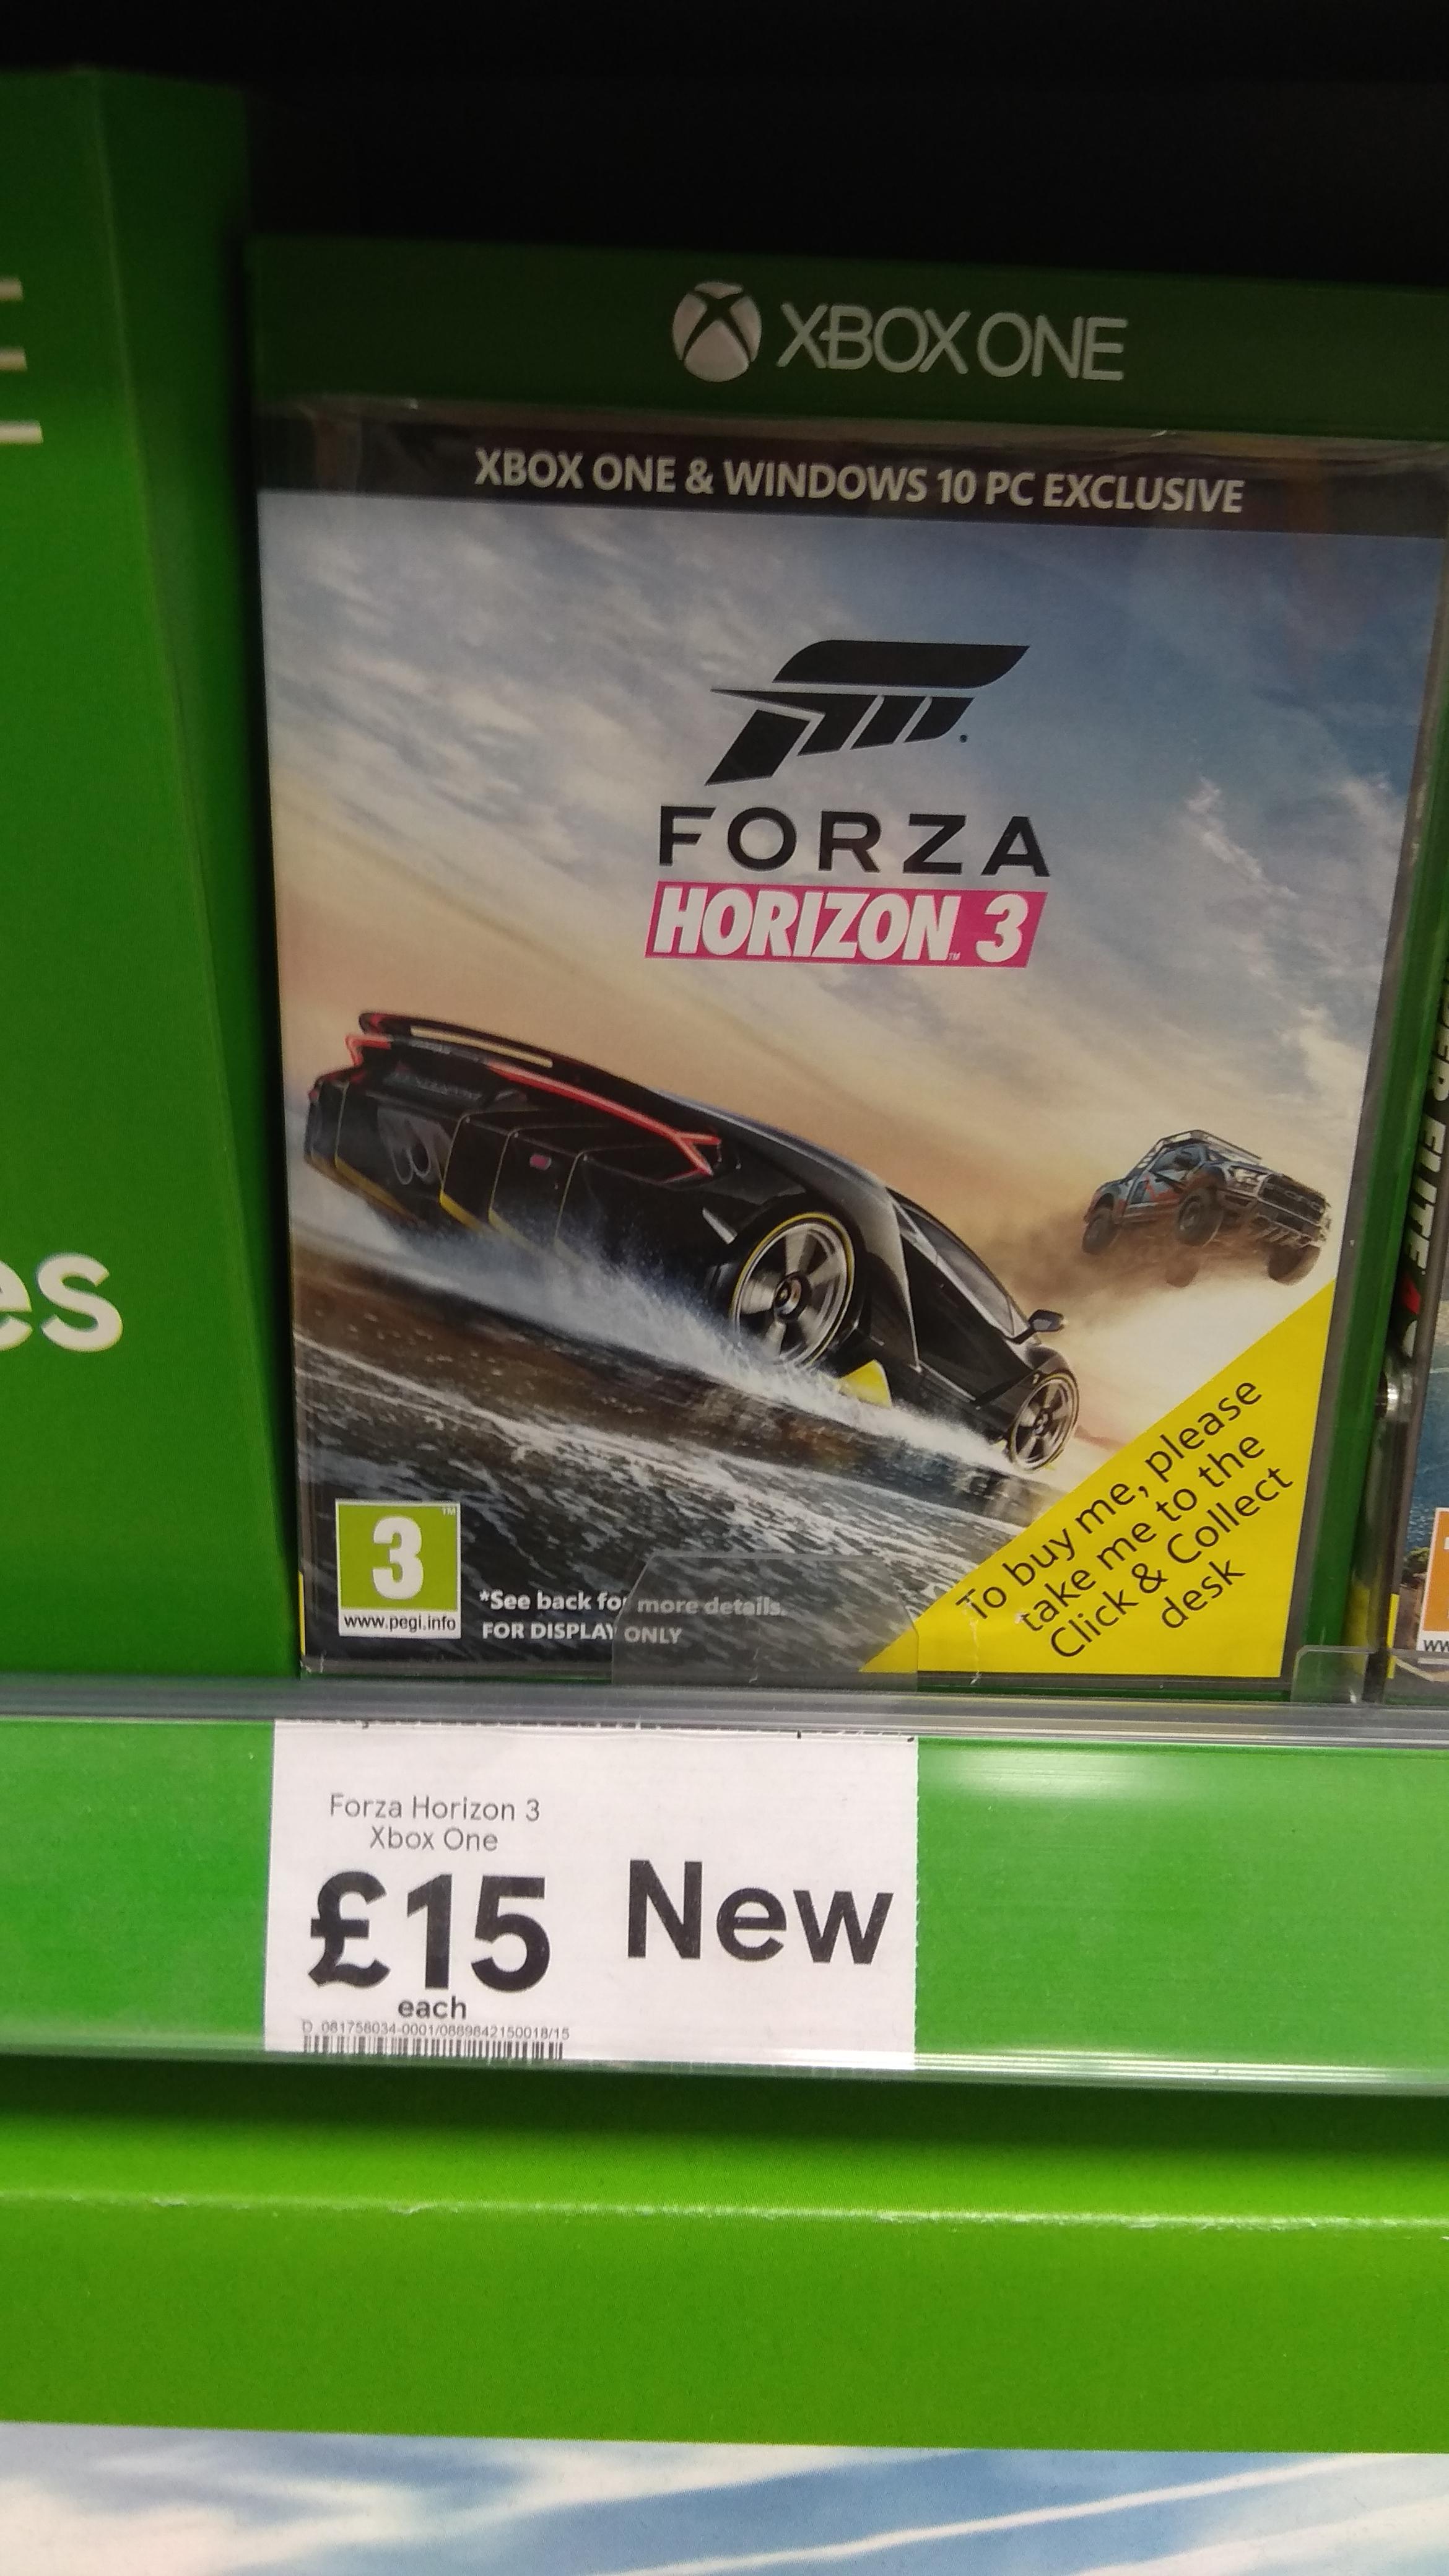 Forza Horizon 3 Xbox One instore at Tesco £15